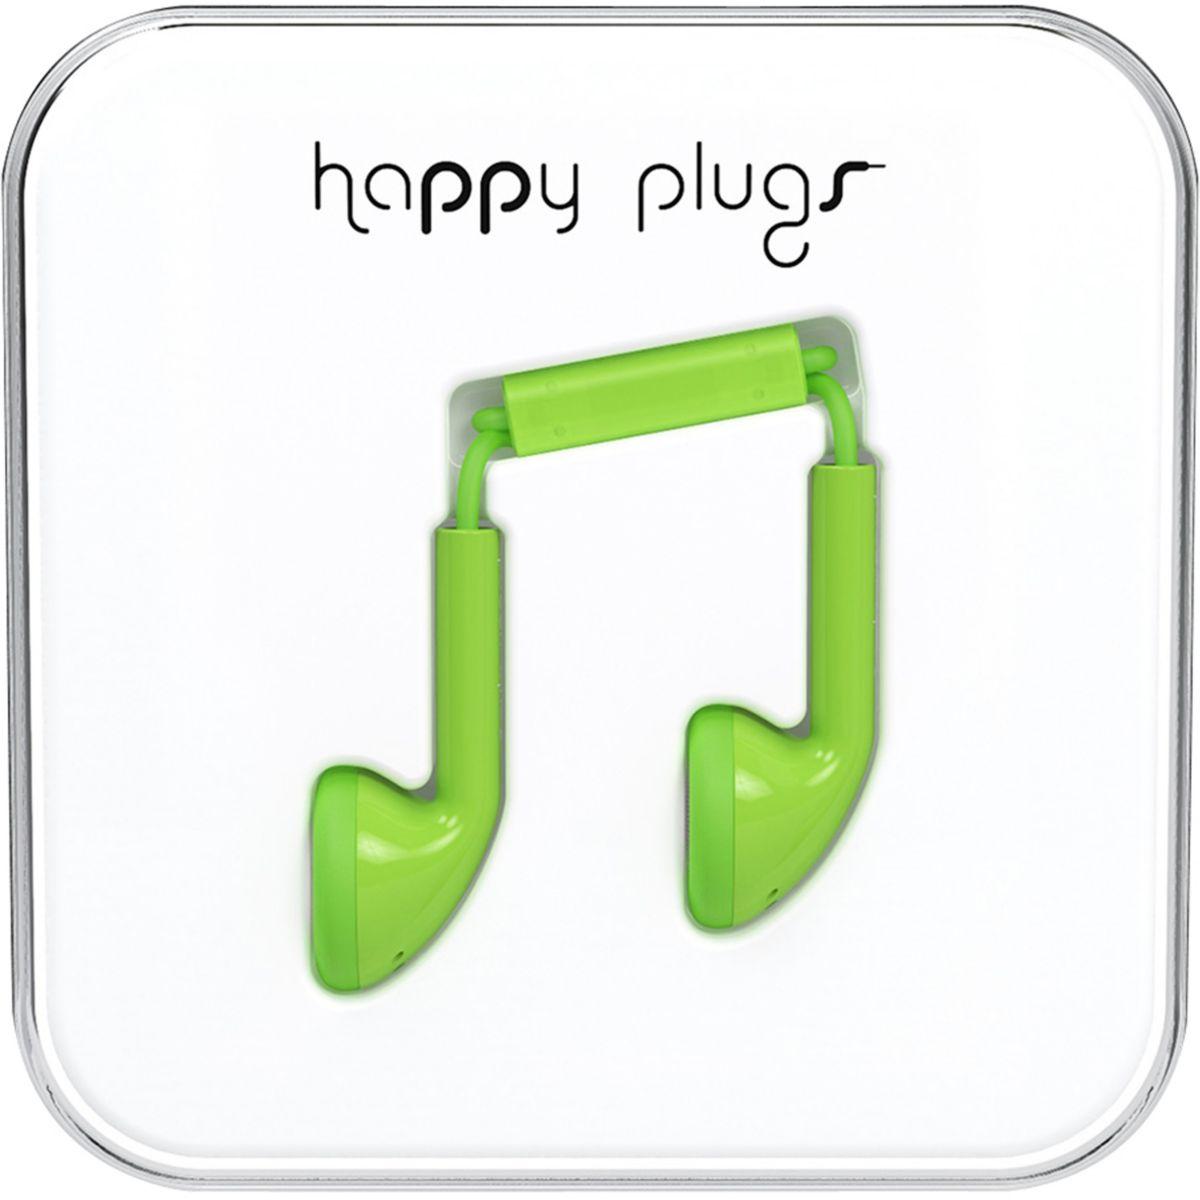 Ecouteurs avec micro HAPPY PLUGS Earbud Mint